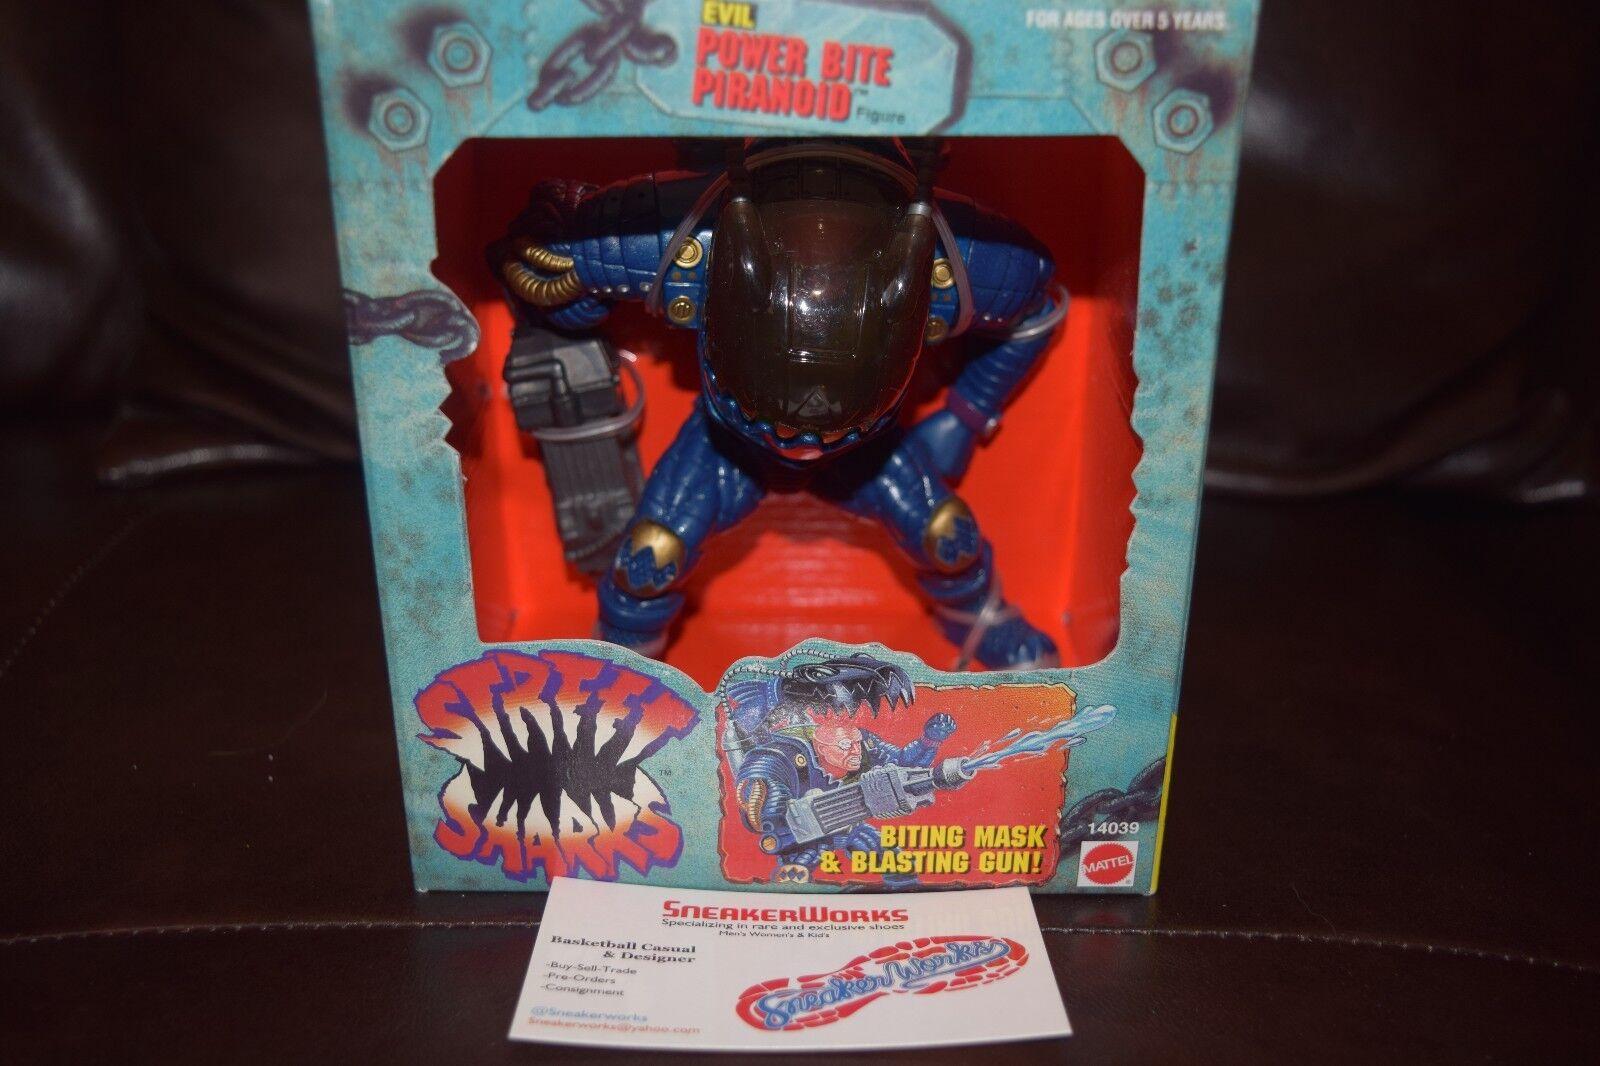 Nuovo Vintage Mattel Street Sharks Evil Power Bite Piranoid Action Figure 1995 MIB